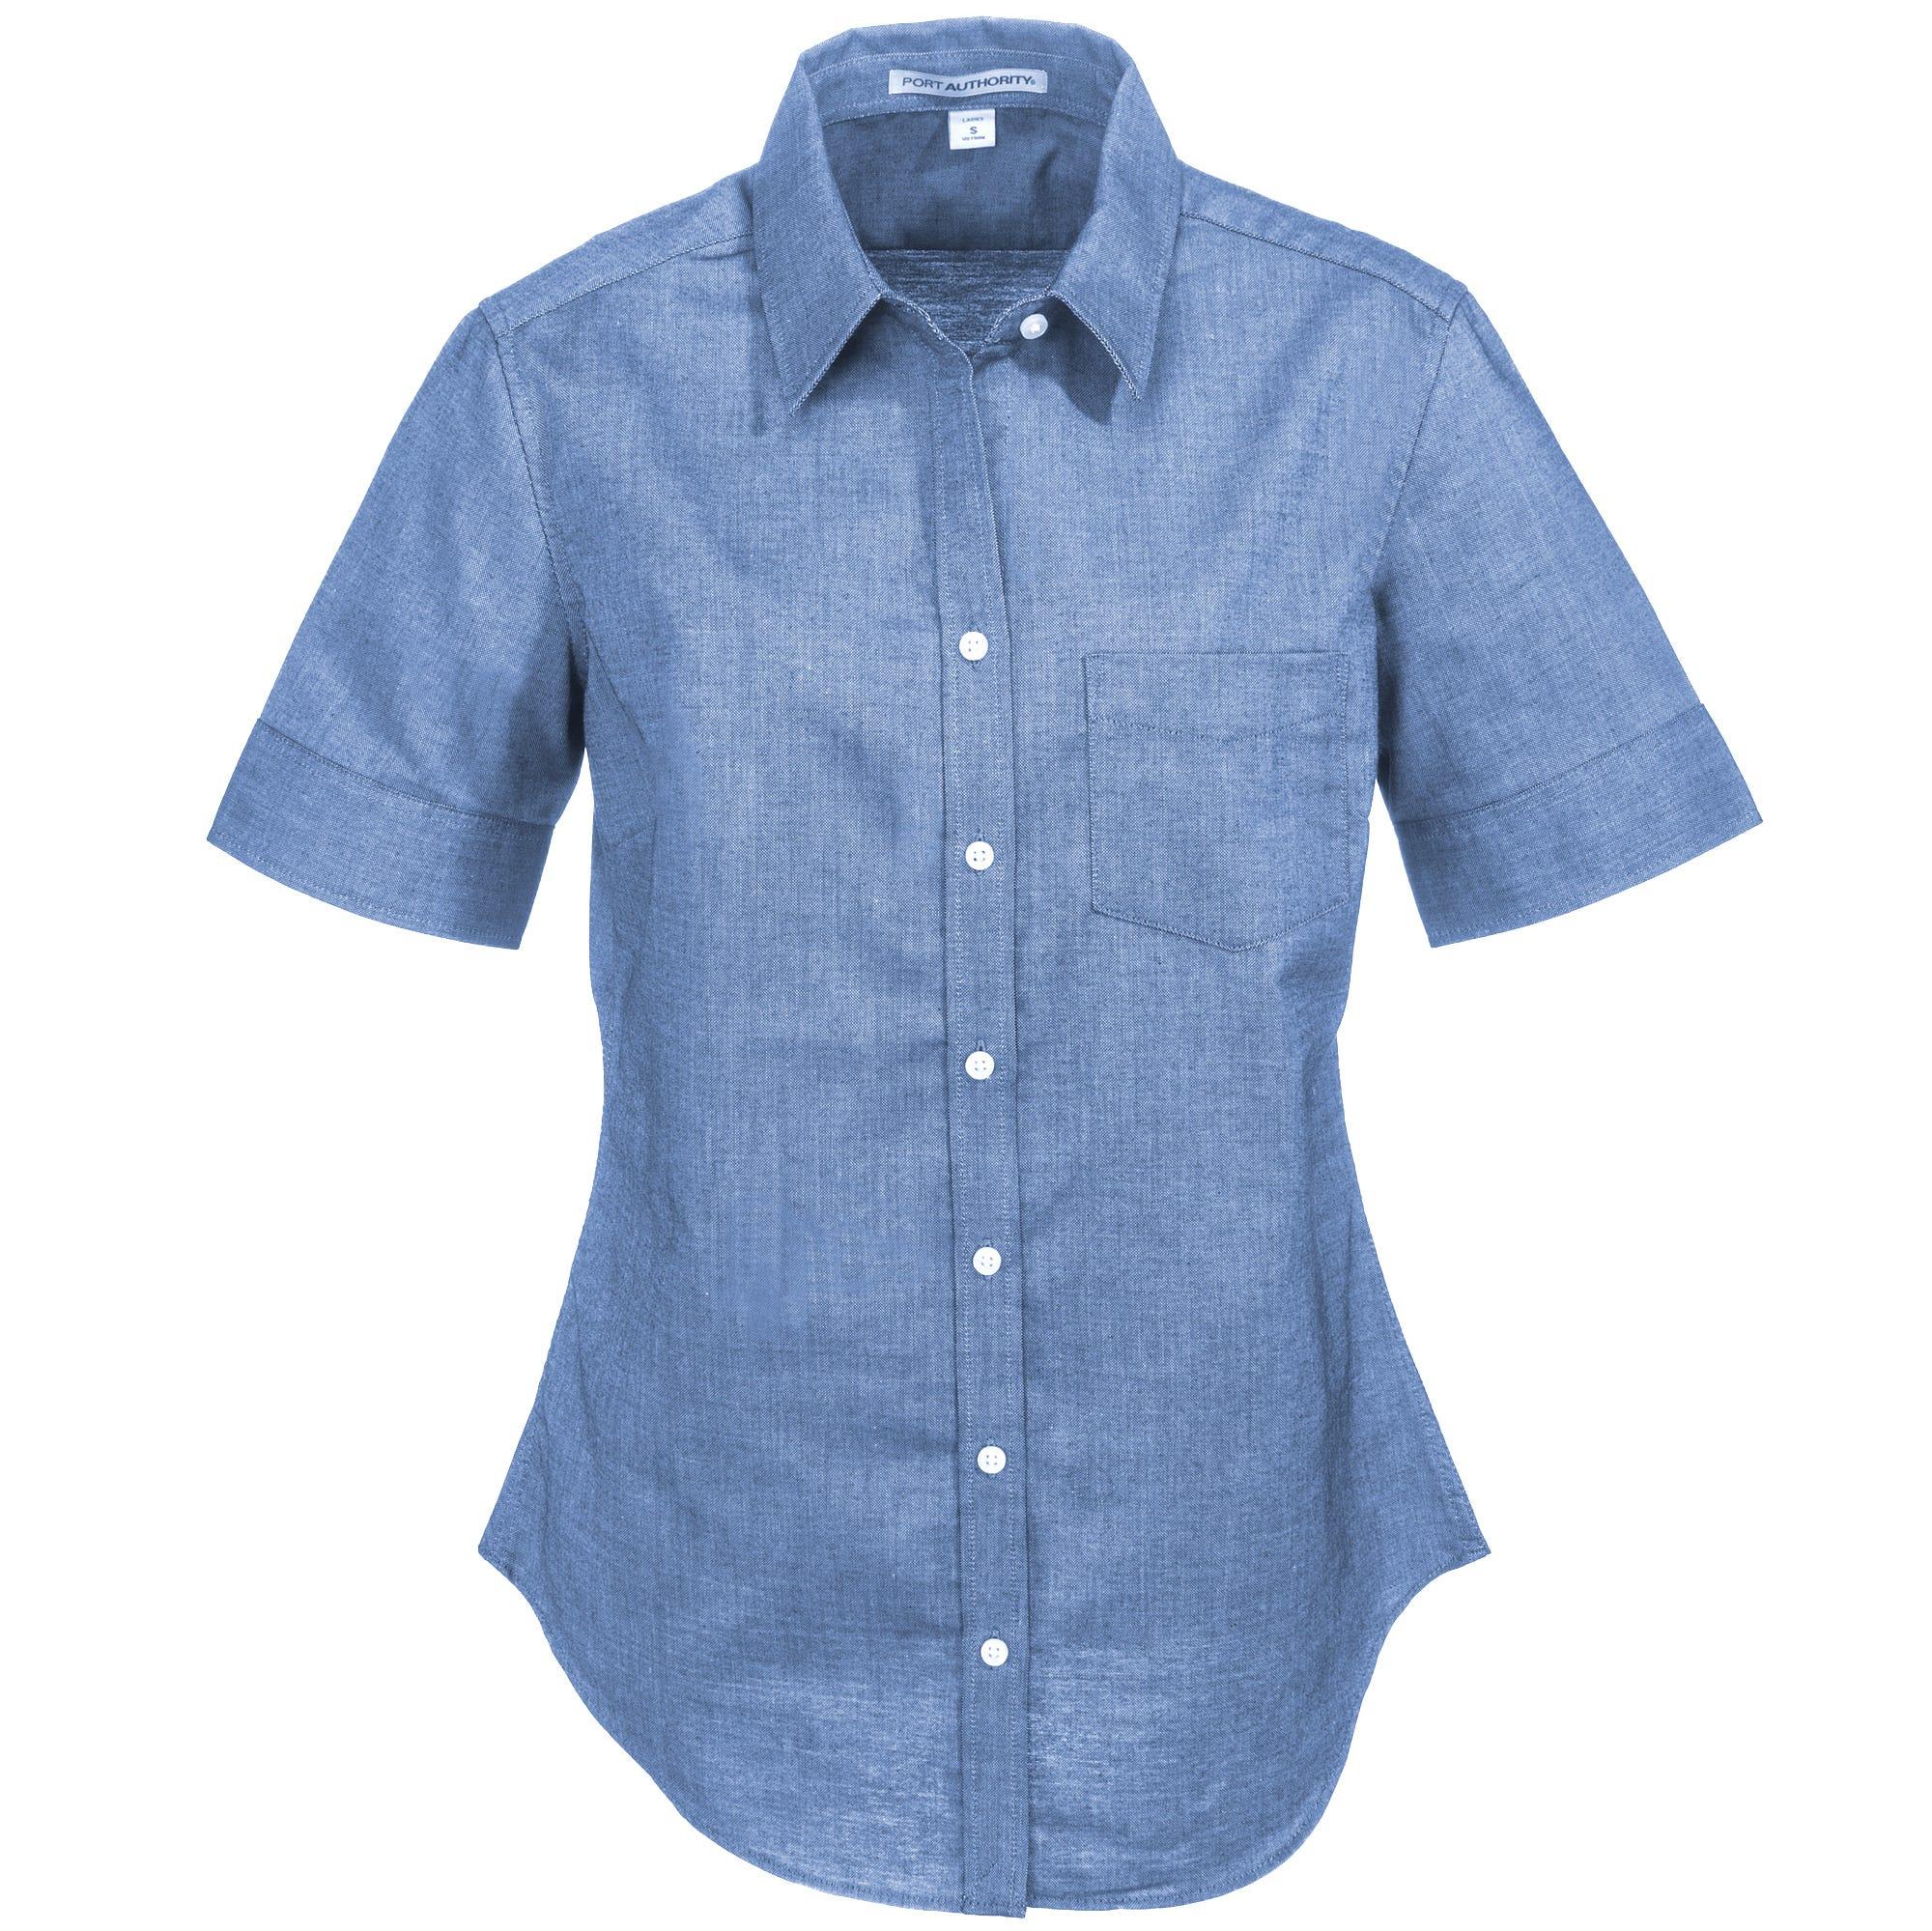 Port Authority Women's L659 NVY Navy Blue SuperPro Oxford Short-Sleeve Shirt